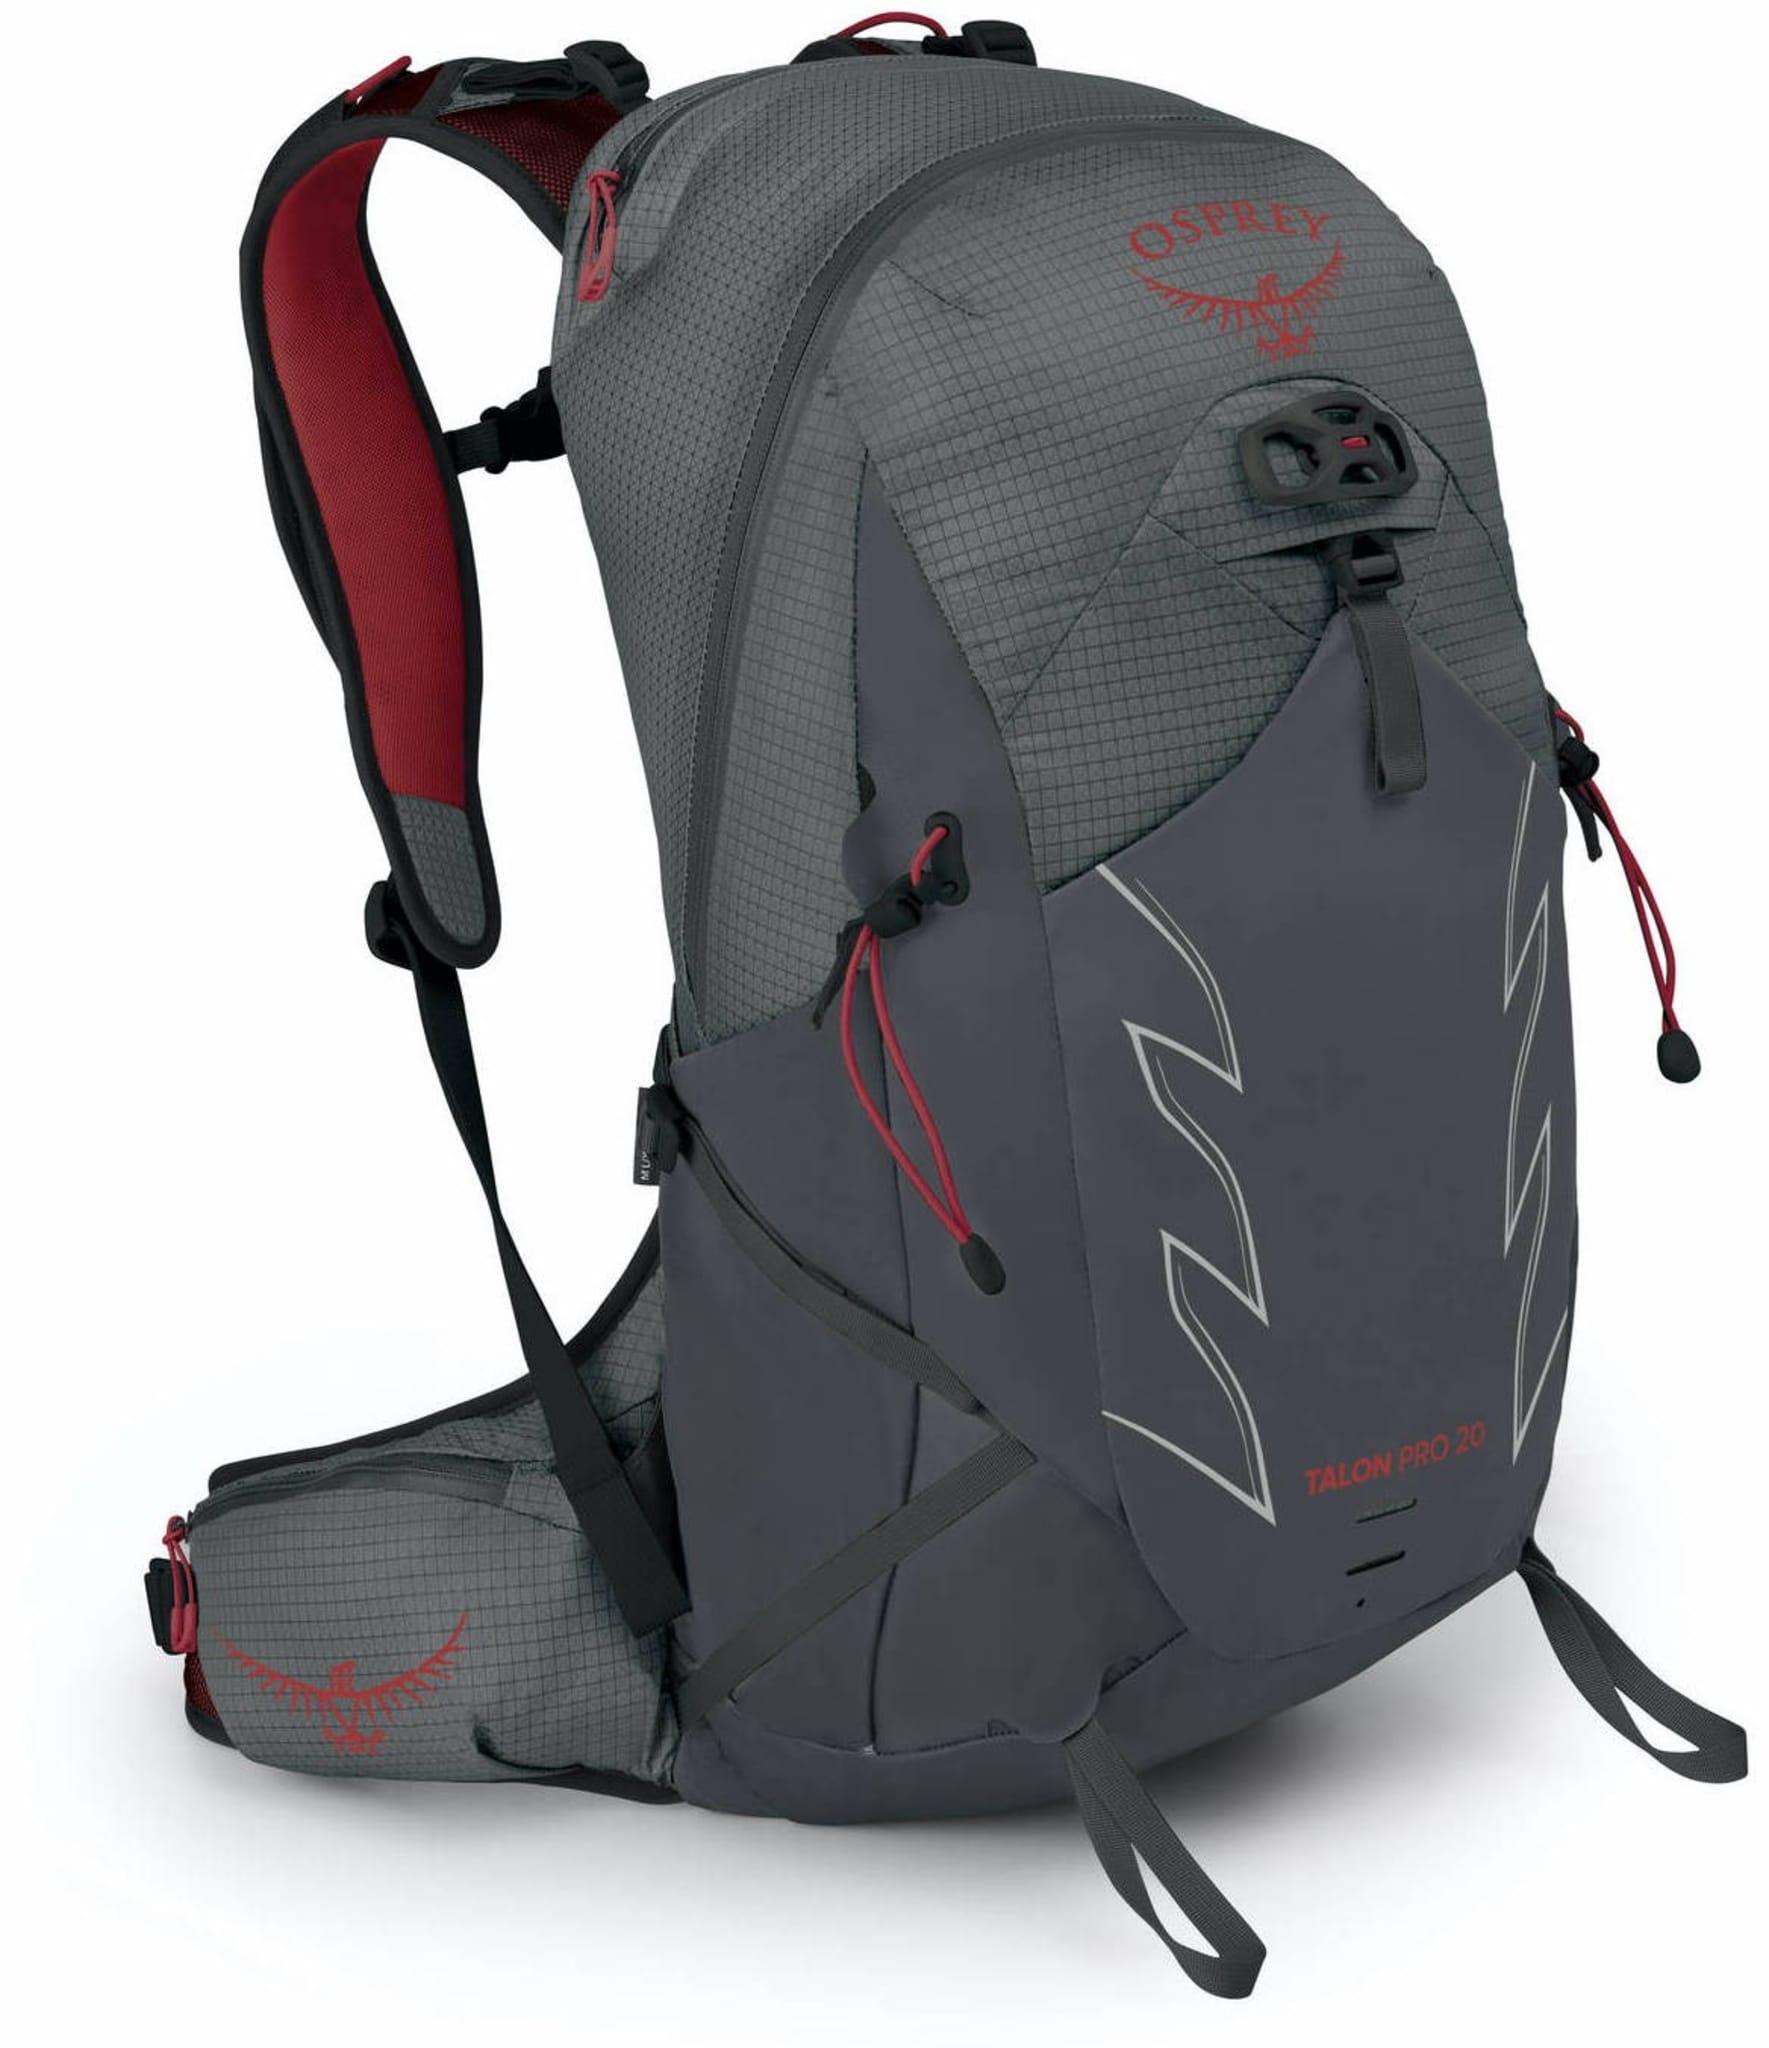 Talon Pro 20